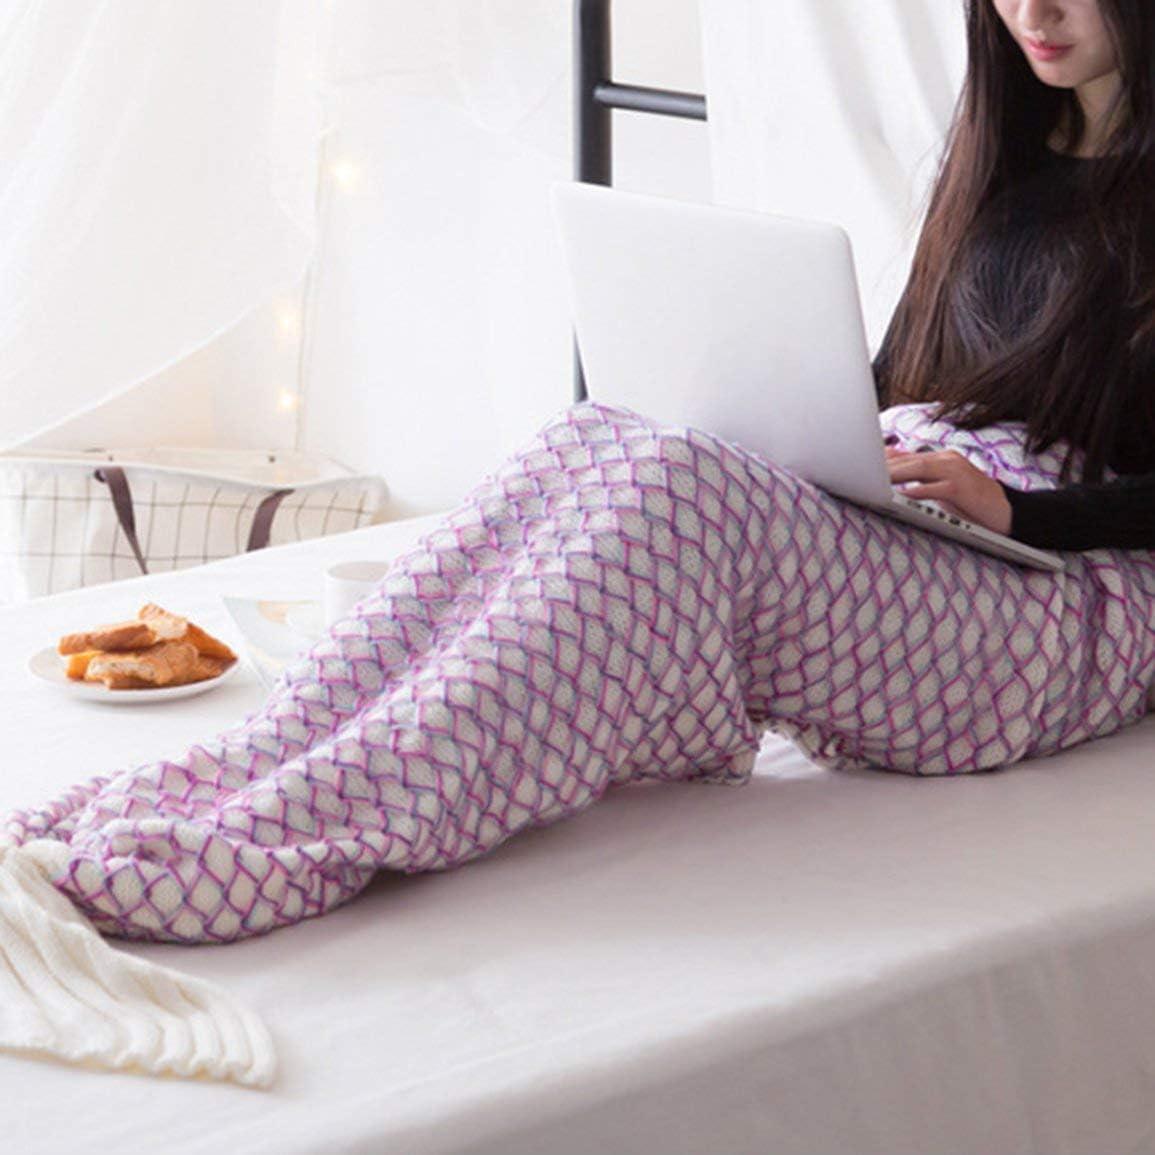 Manta de sirena Manta de dormir hecha a mano Sofá de TV Manta de cola de sirena Niños adultos Bolsa de ganchillo para bebé Ropa de cama Bolsa de tiro